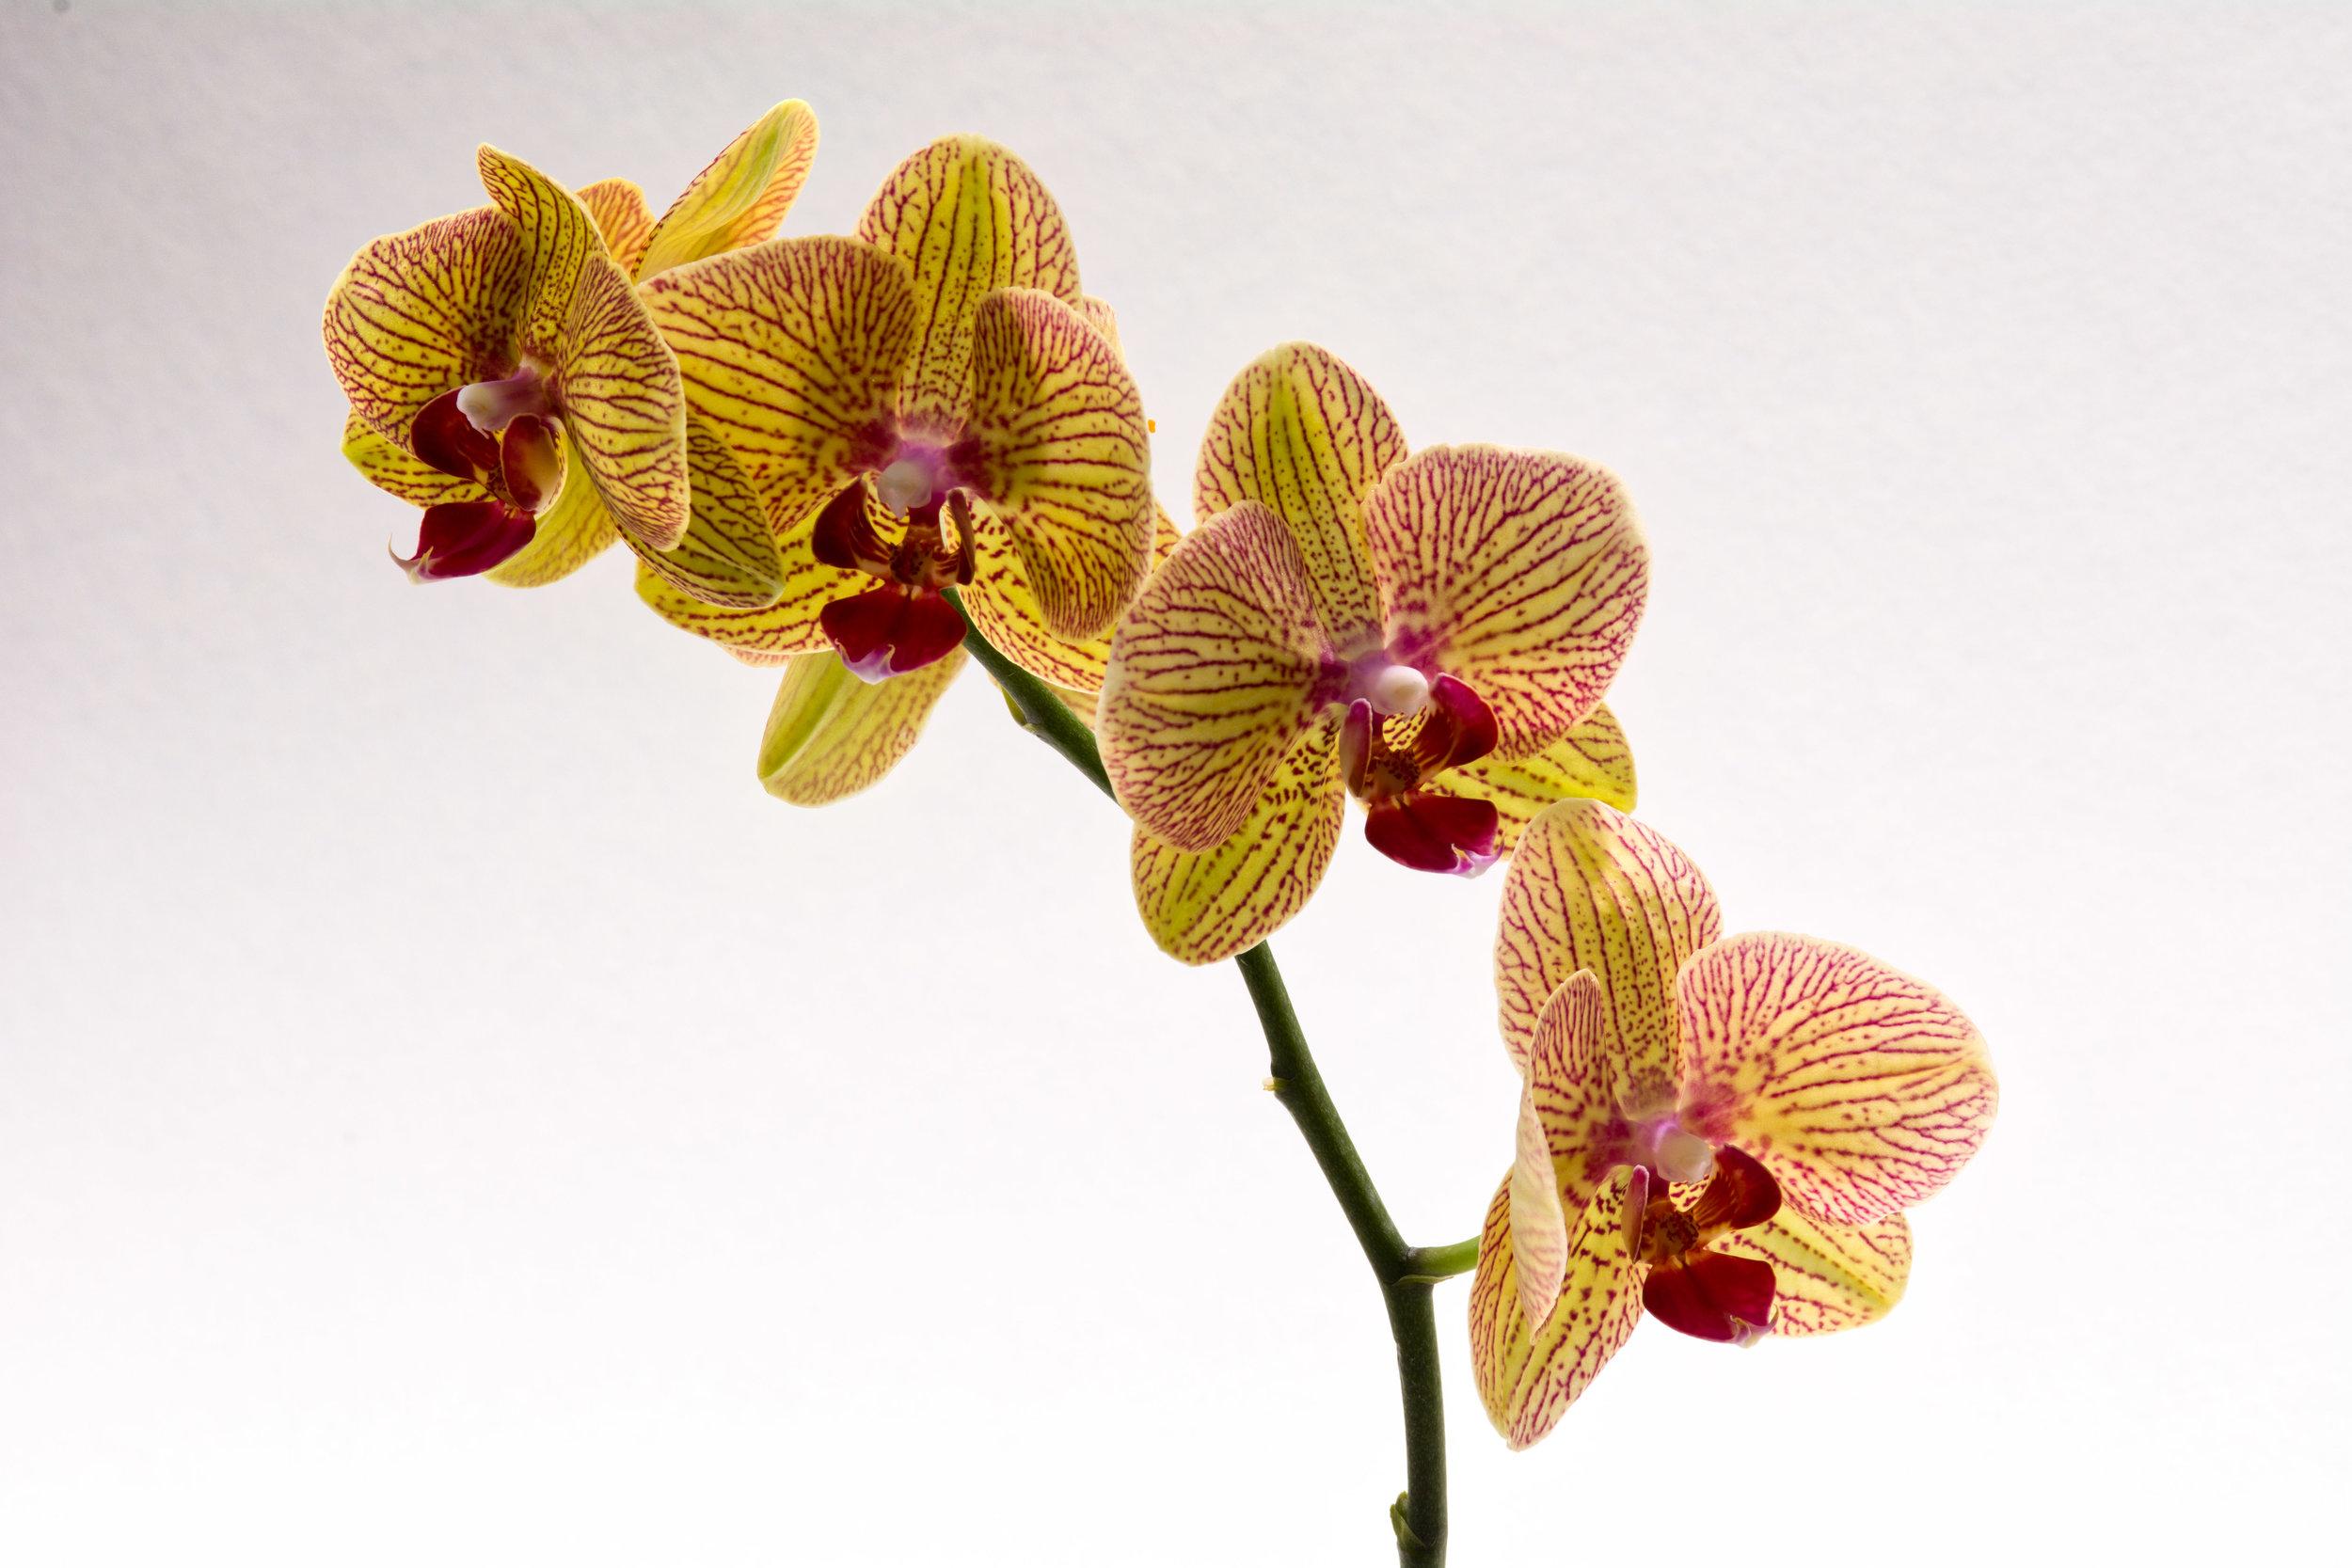 Phalaenopsis Orchid - Tiger